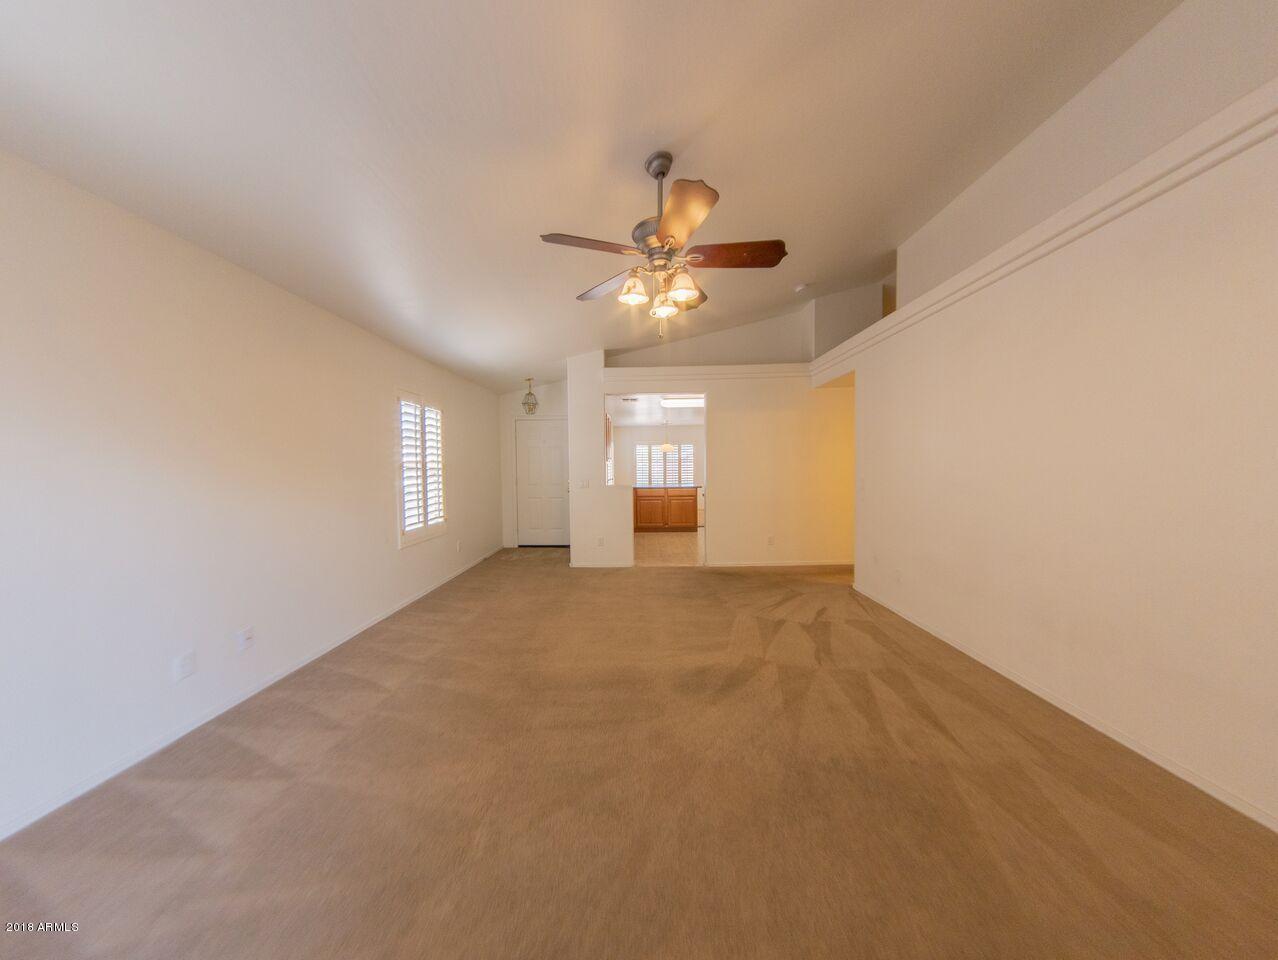 12481 W Via Camille Road El Mirage, AZ 85335 - MLS #: 5854107